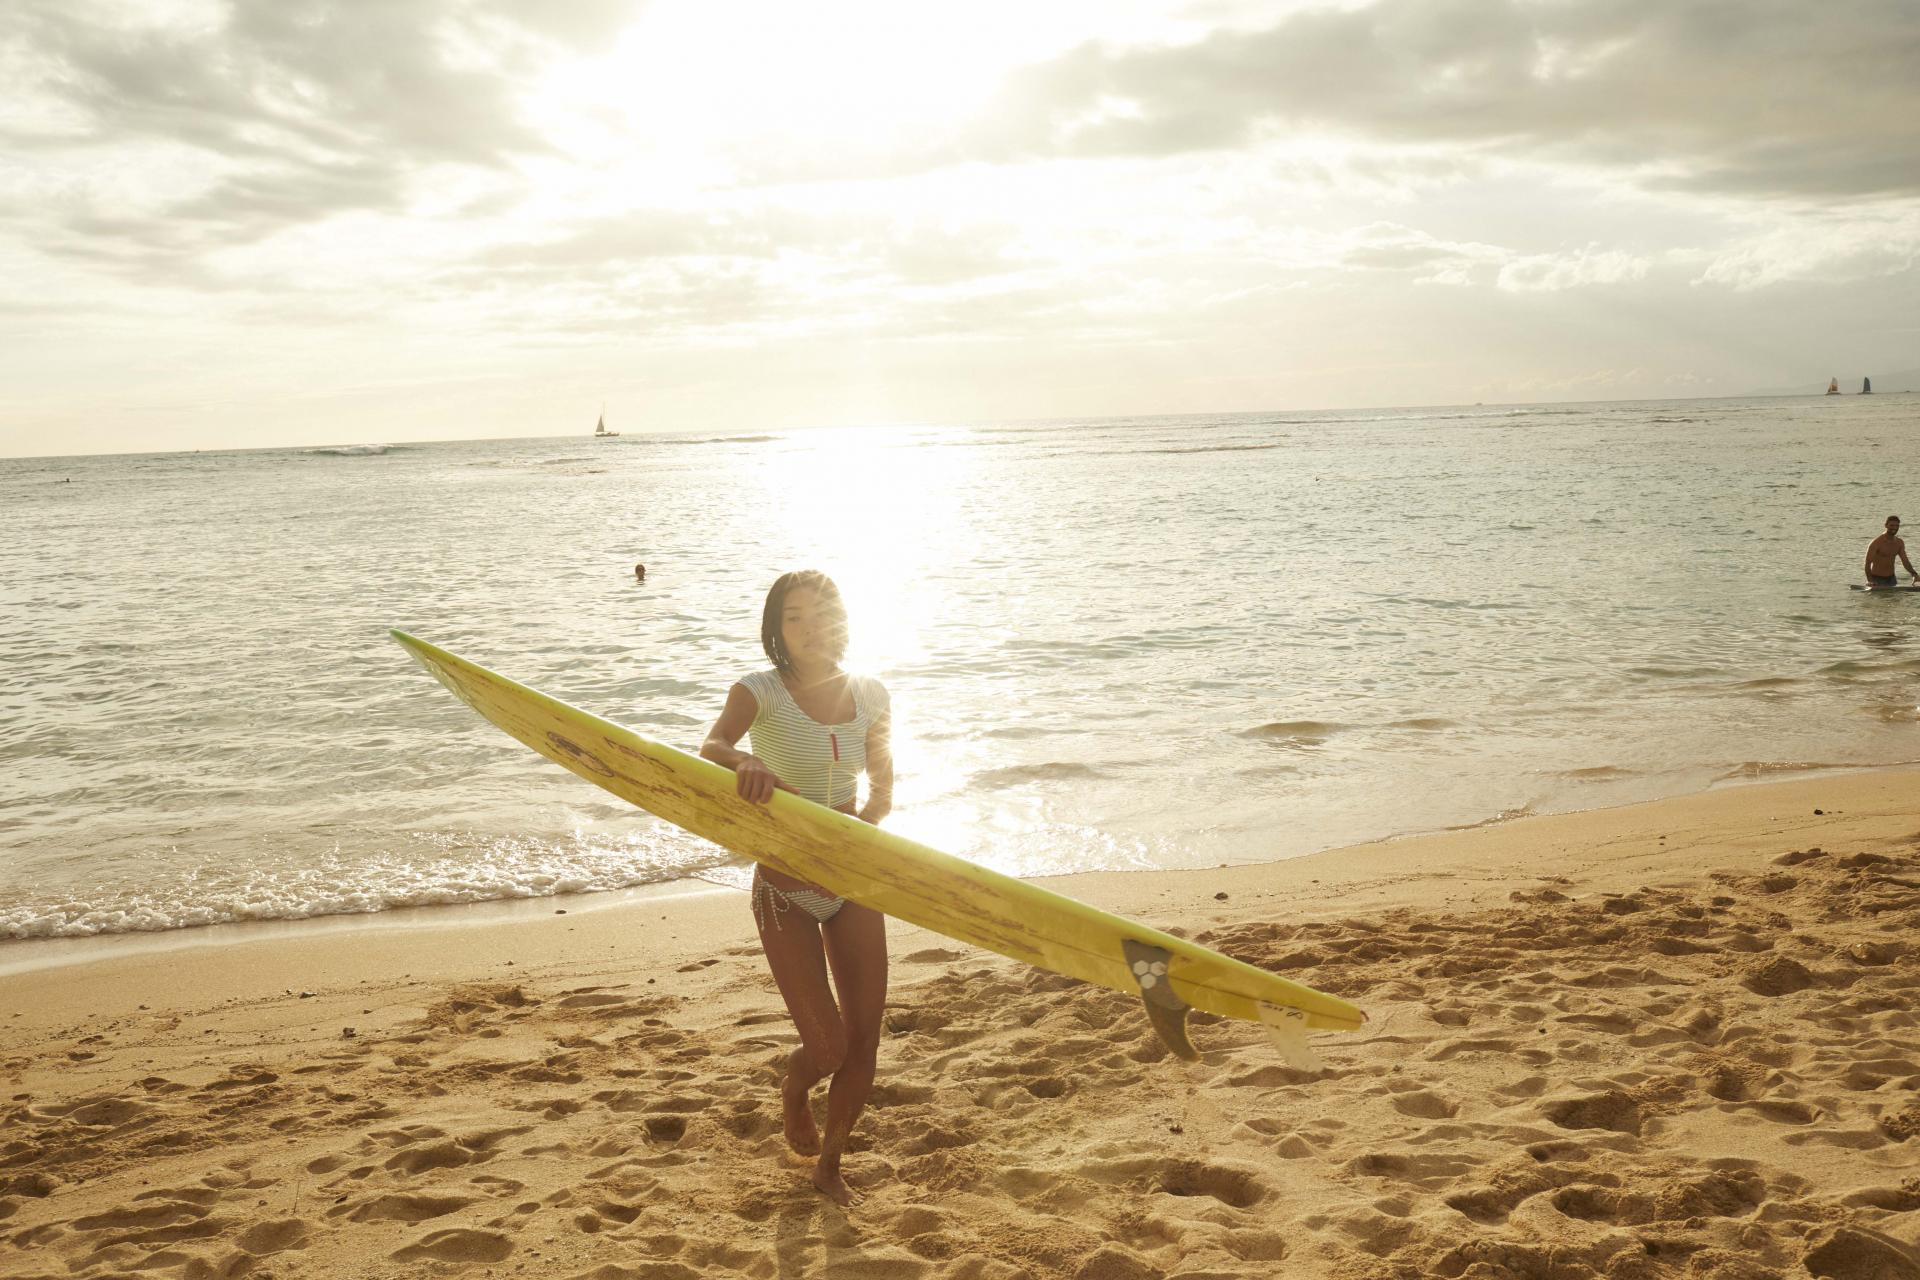 Maui Honeymoon, maui hawaii honeymoon, planning a hawaii honeymoon, what to pack for maui